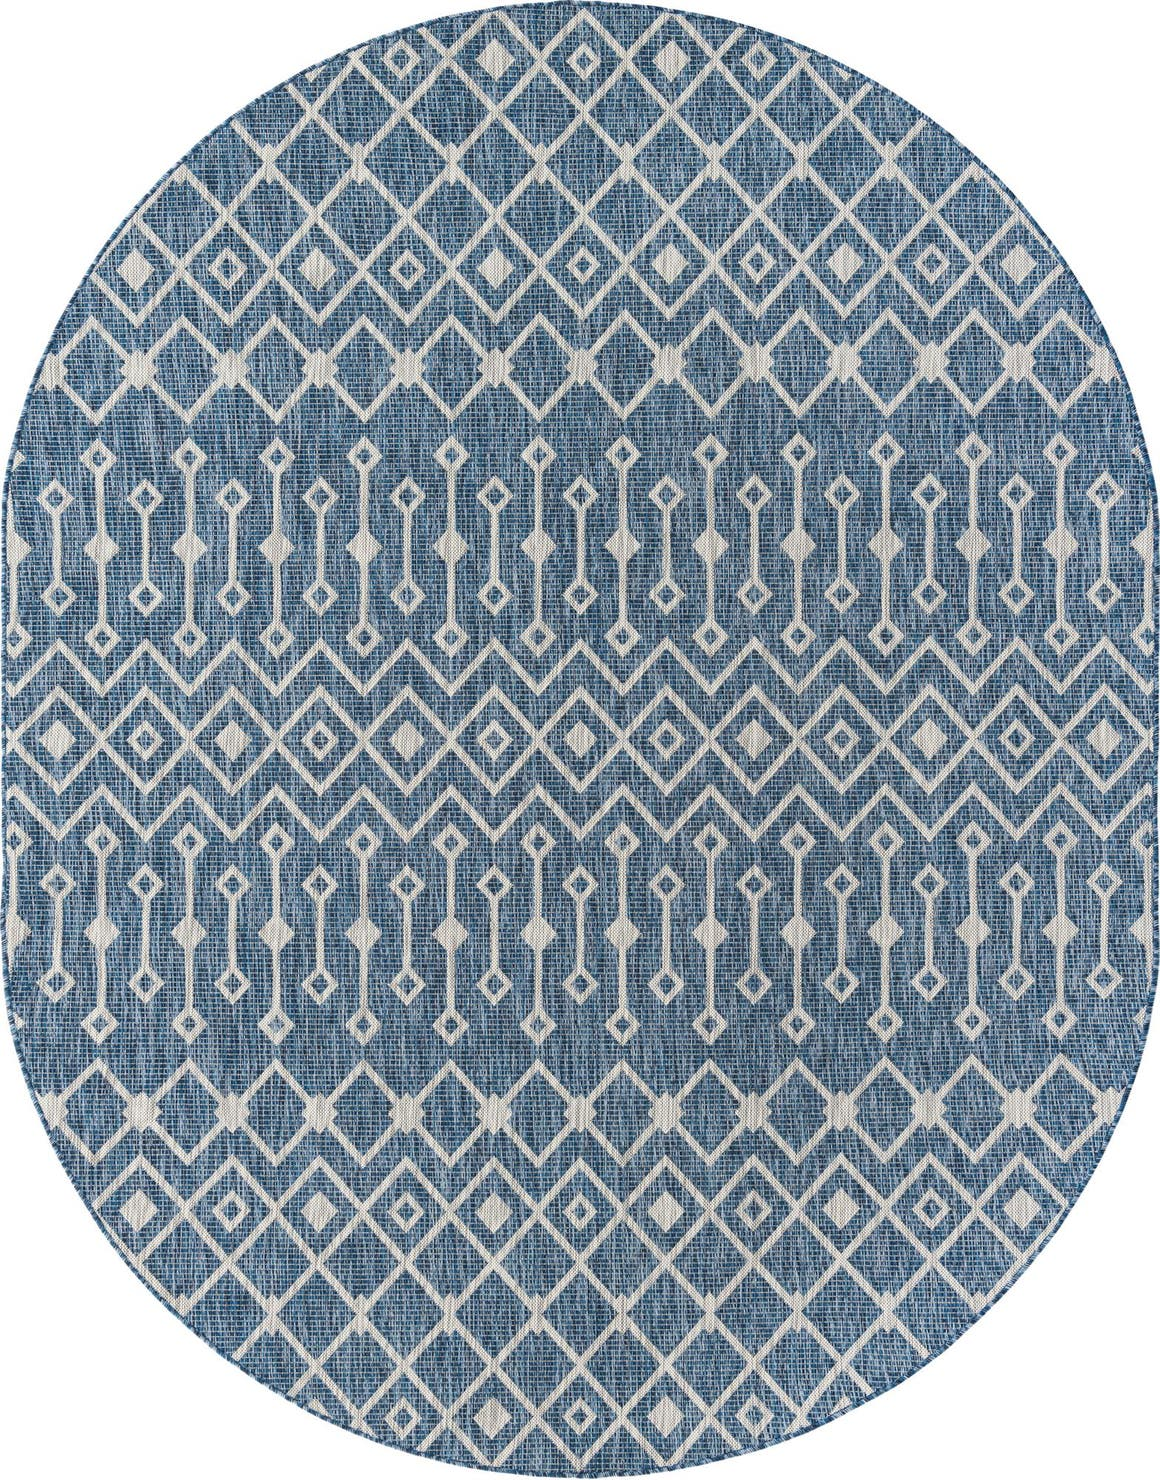 7' 10 x 10' Outdoor Trellis Oval Rug main image